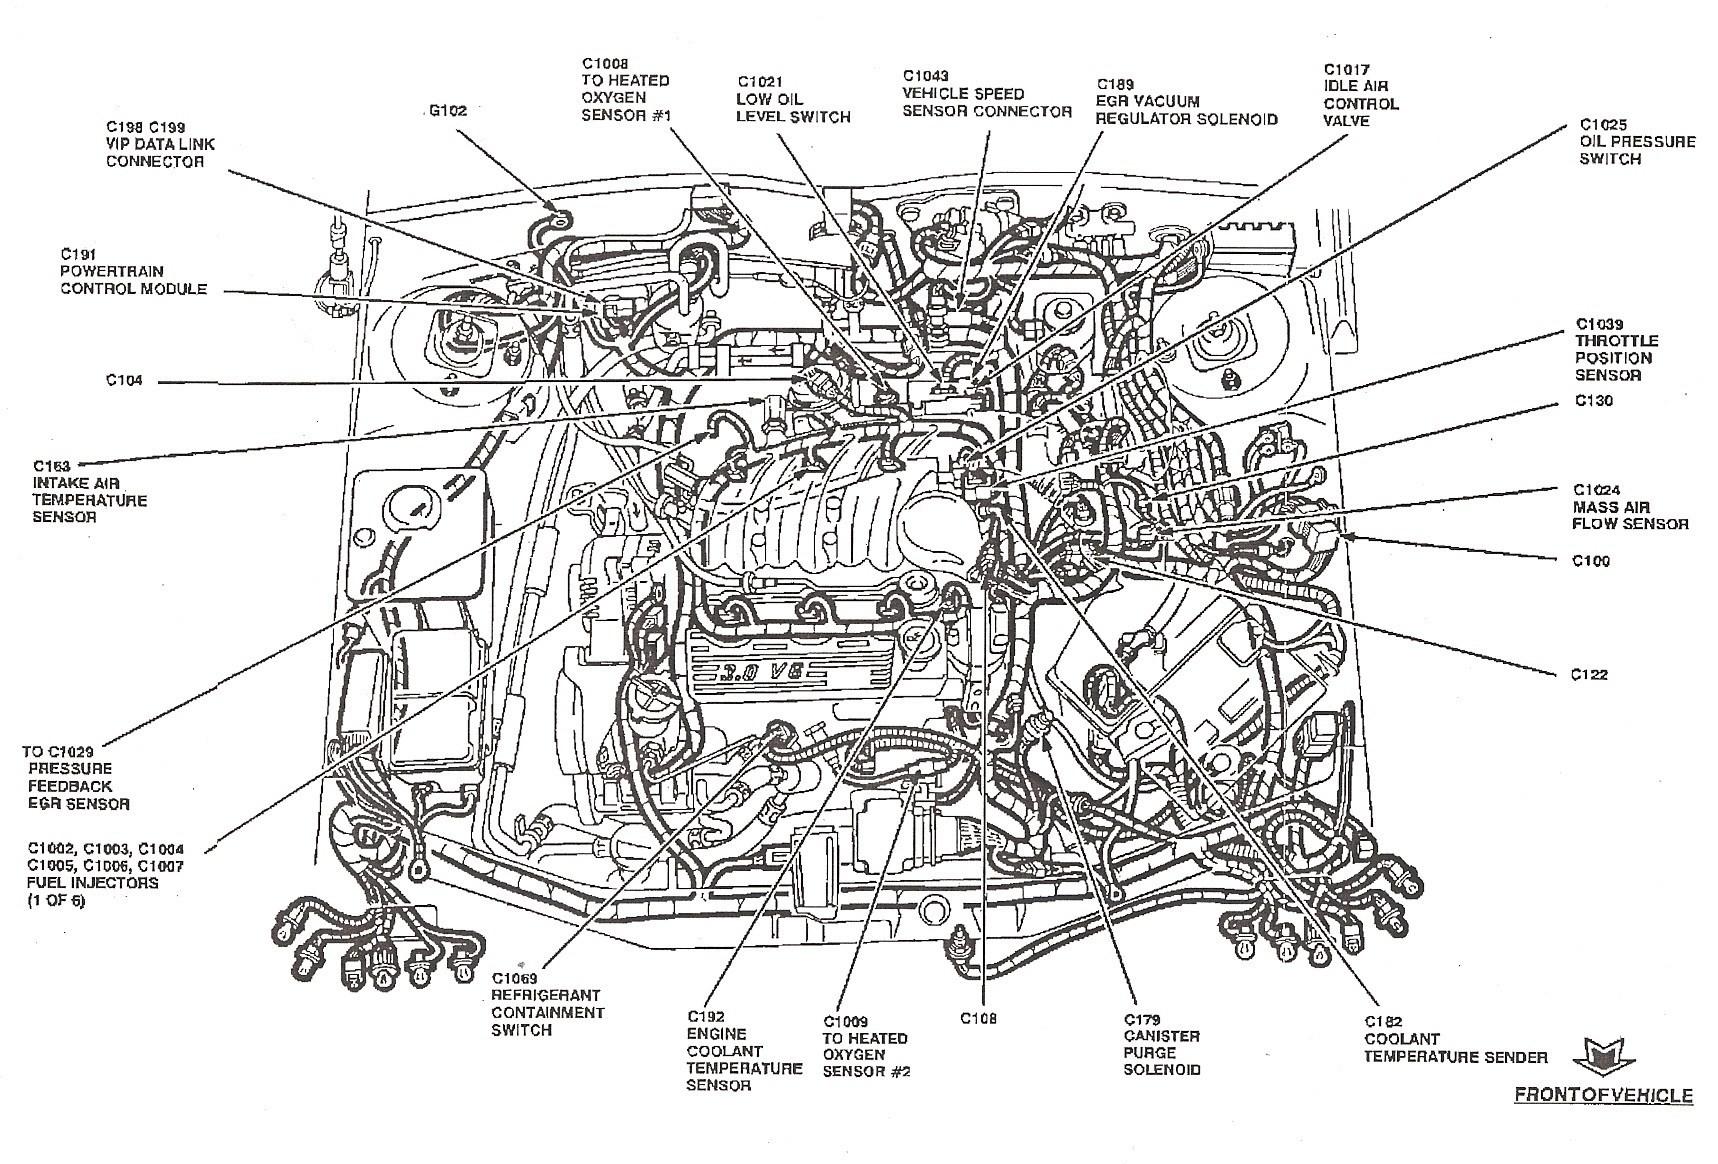 2004 ford Freestar Engine Diagram Fuel Line Diagram ford Taurus Fuel Line Diagram ford F150 Fuel Of 2004 ford Freestar Engine Diagram